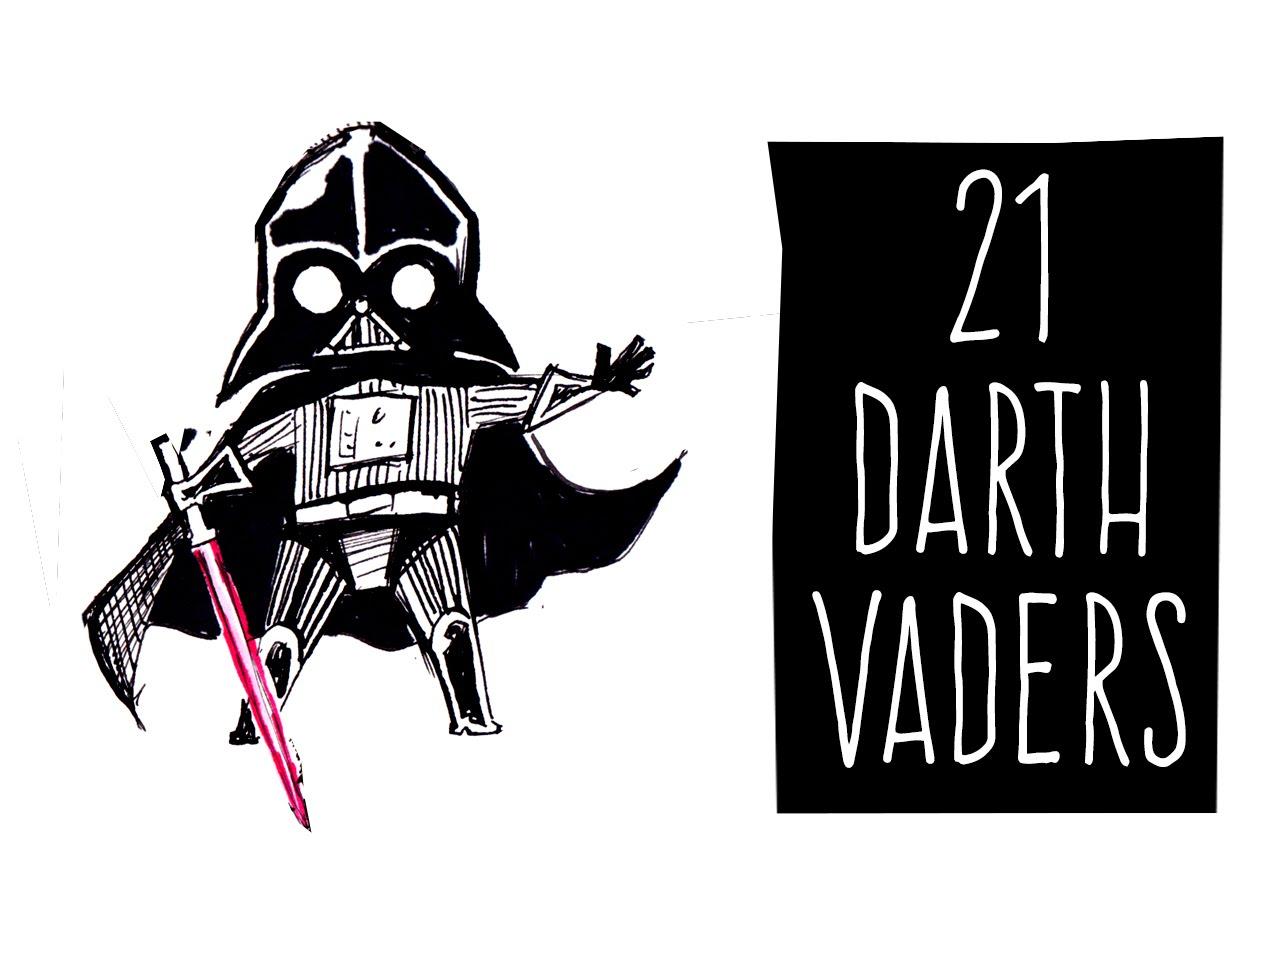 Drawn wars doodle 21 Vaders! Vaders! Doodles YouTube